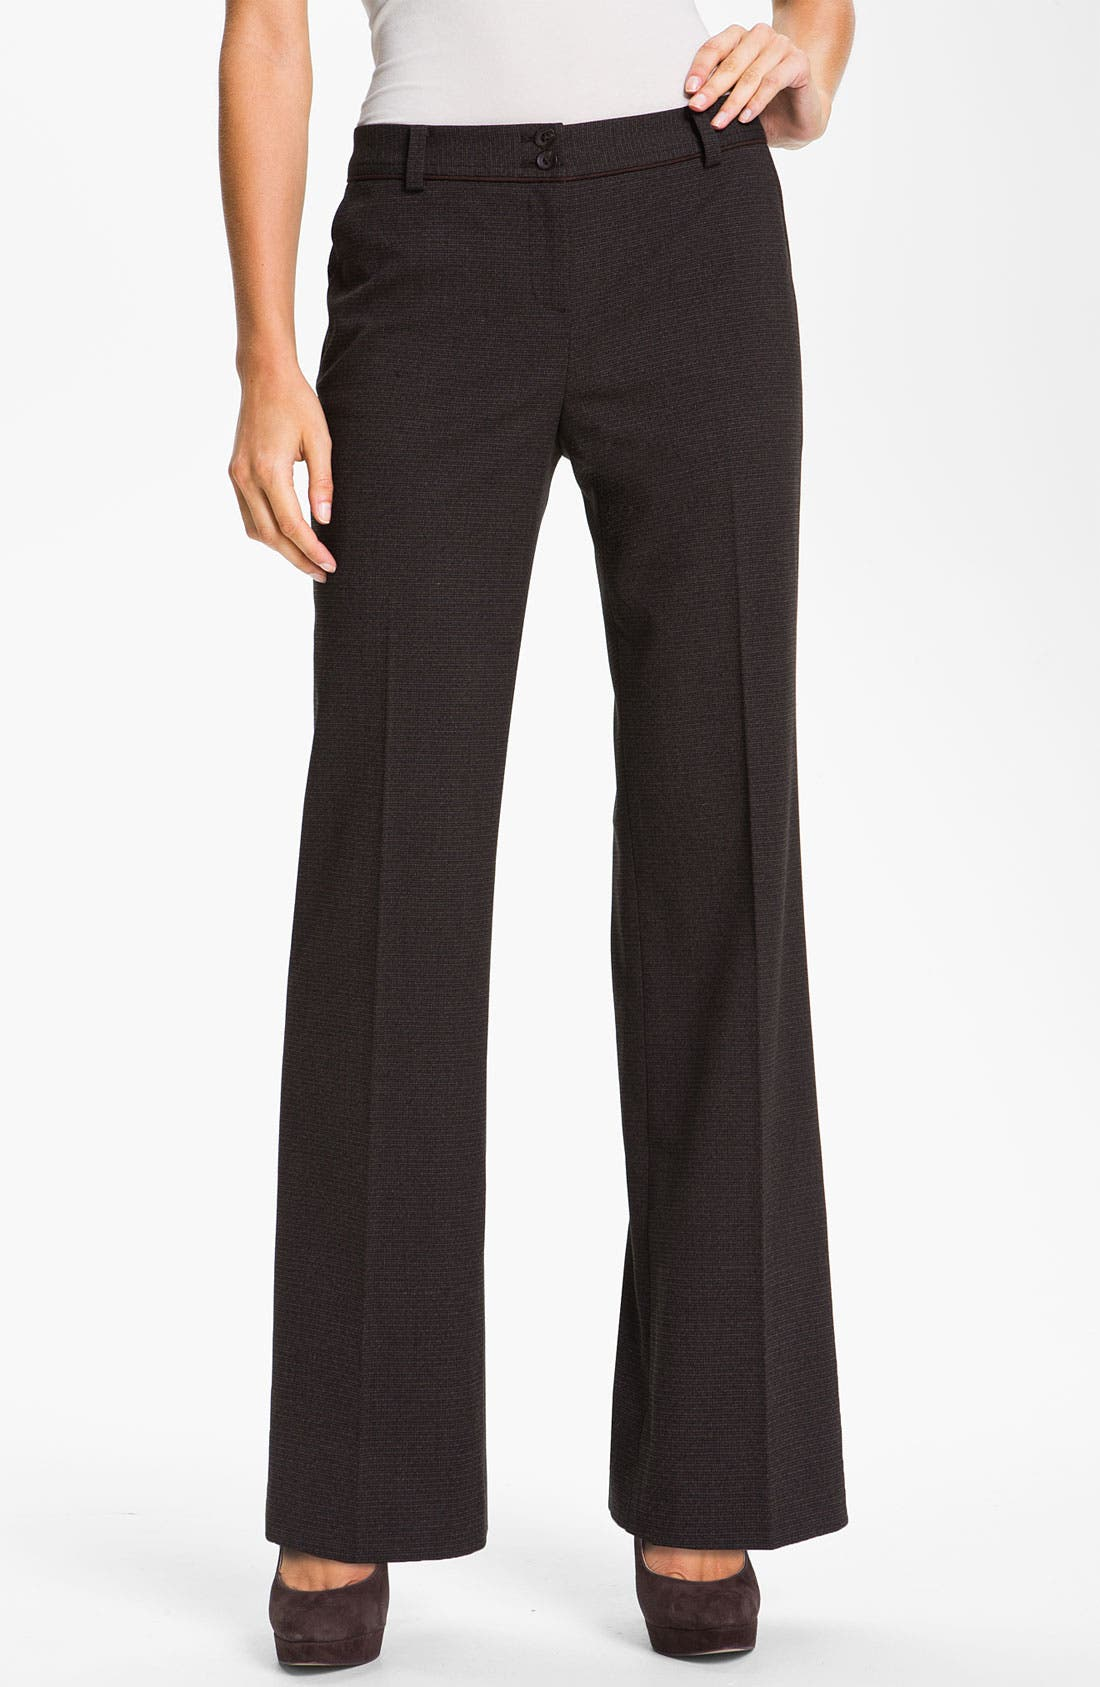 Main Image - Halogen® 'Taylor' Cross Weave Curvy Fit Pants